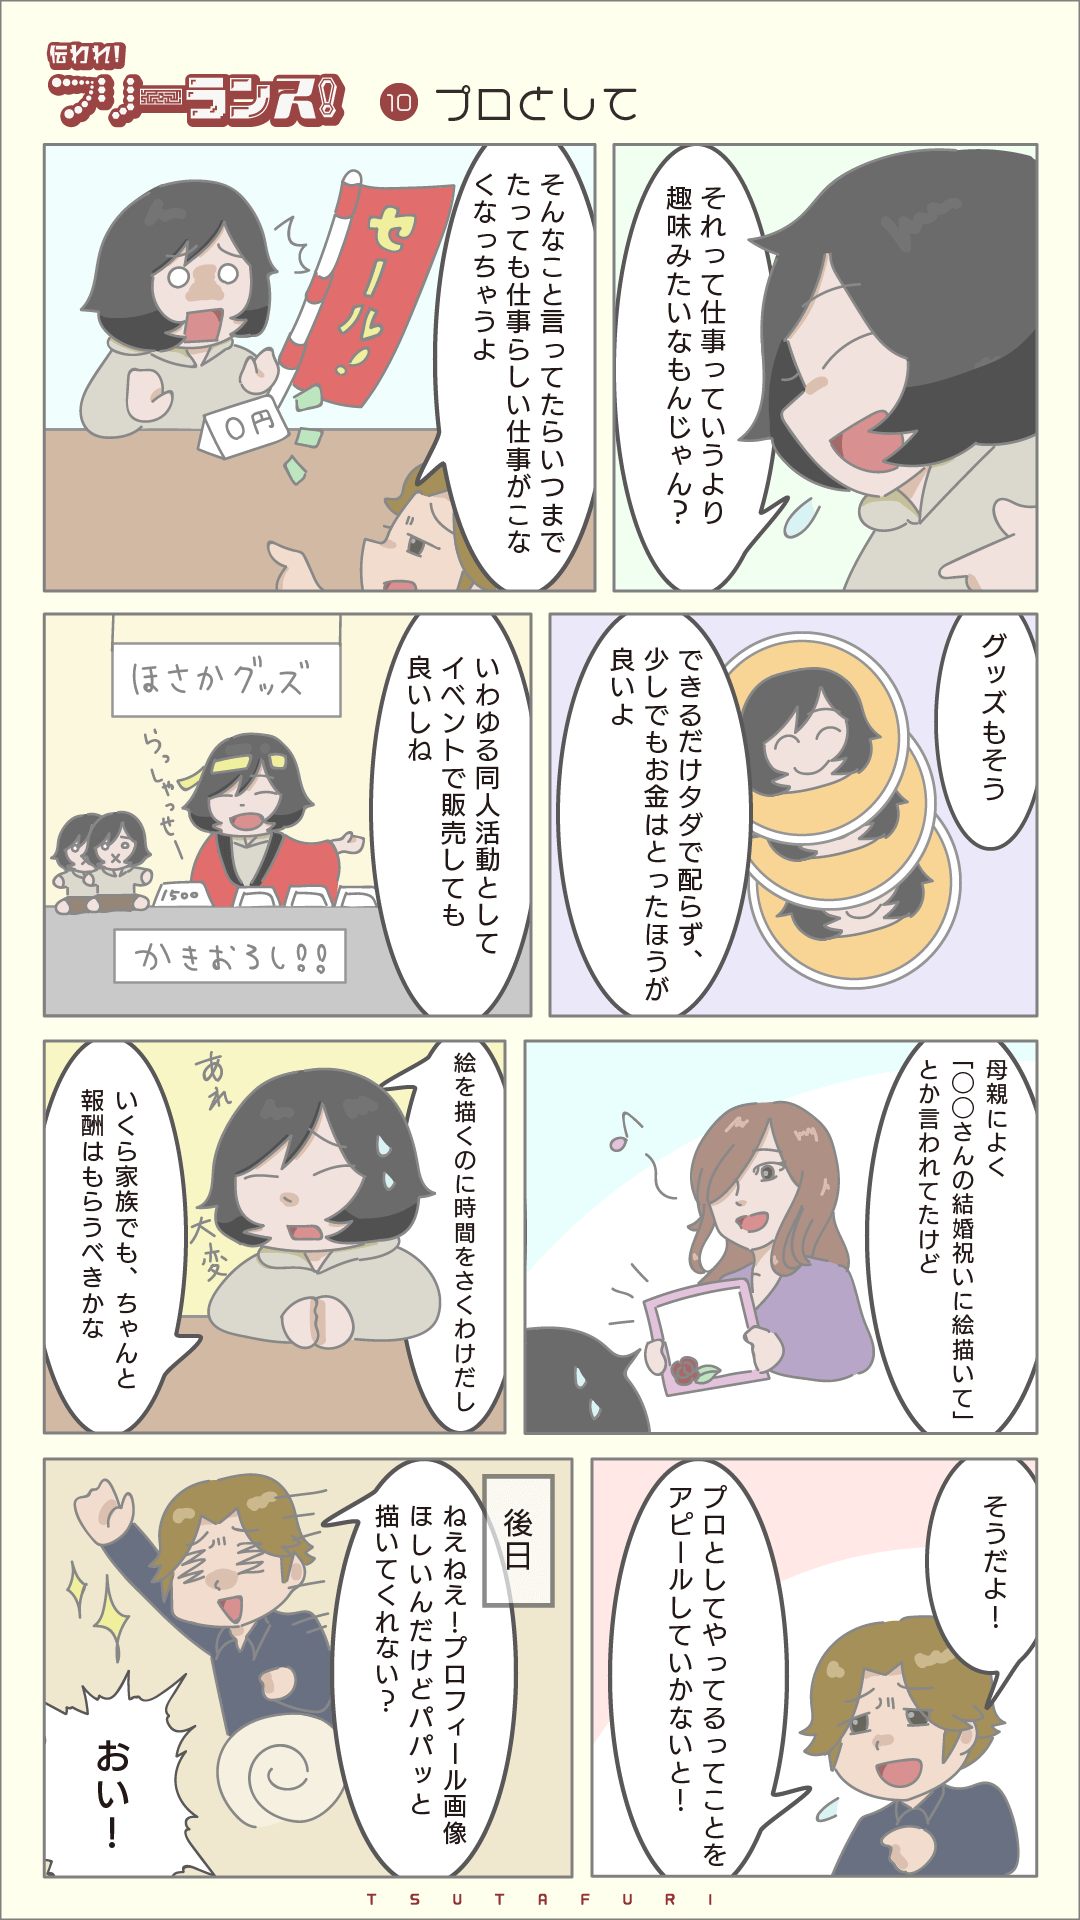 tsutafuri10_2